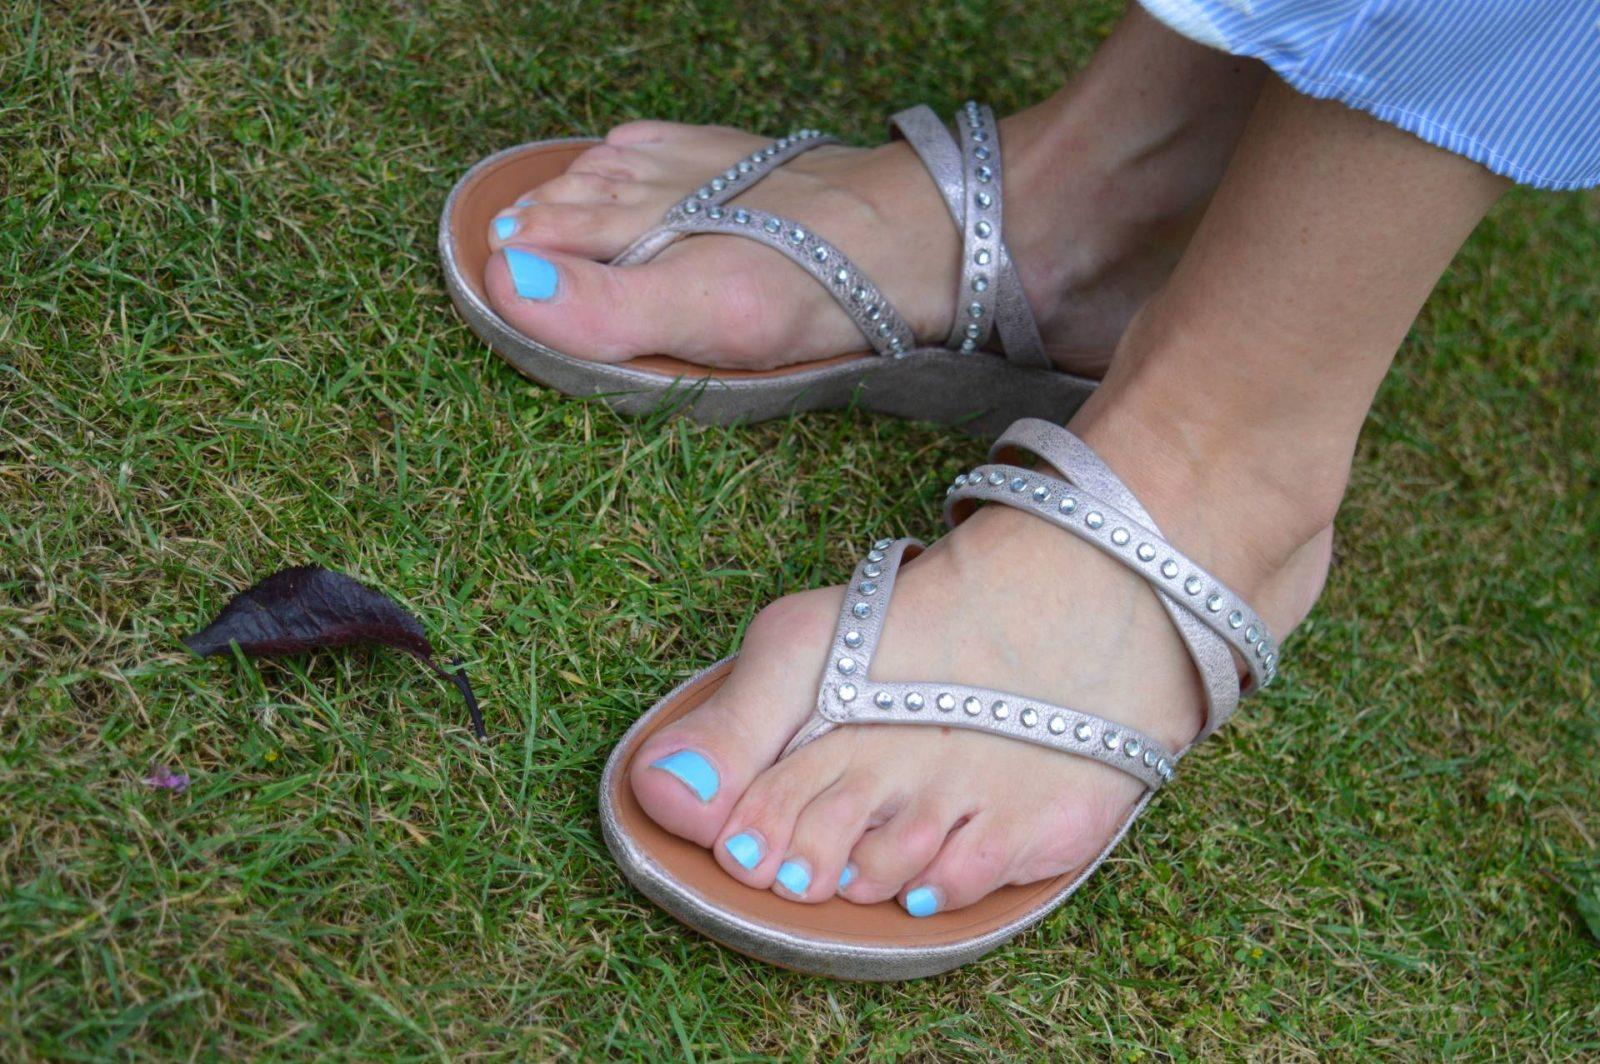 FitFlop Linny crisscross blush sandals